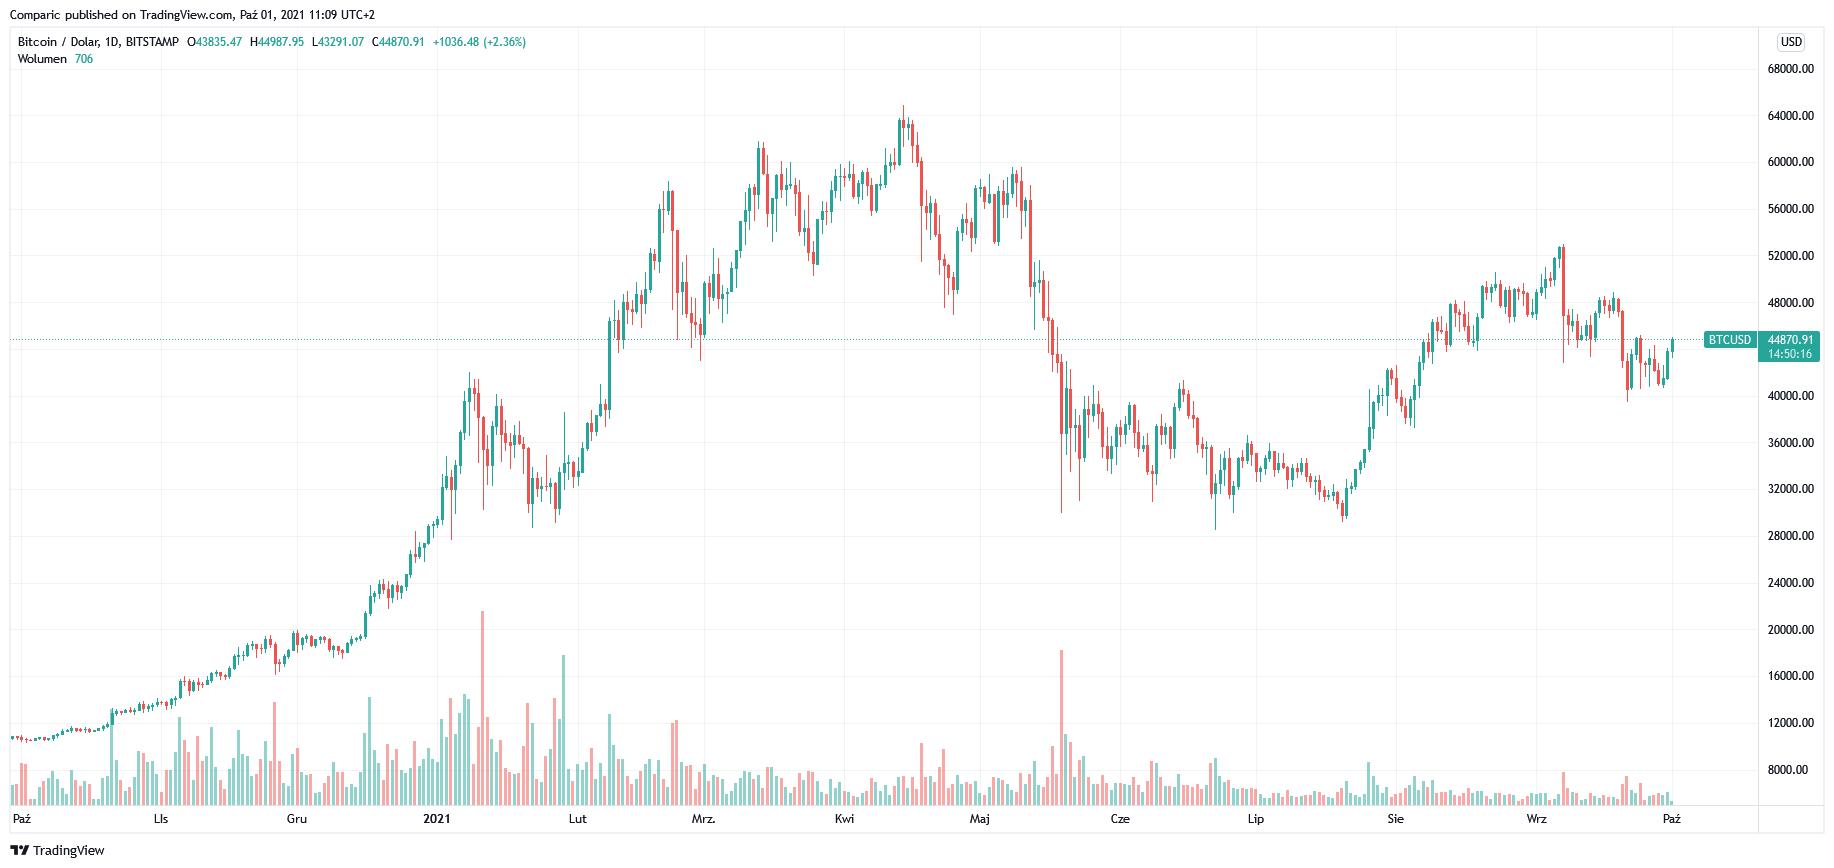 Bitcoin wart nawet 500 tys. dol. za 10 lat, uważa Mike Novogratz